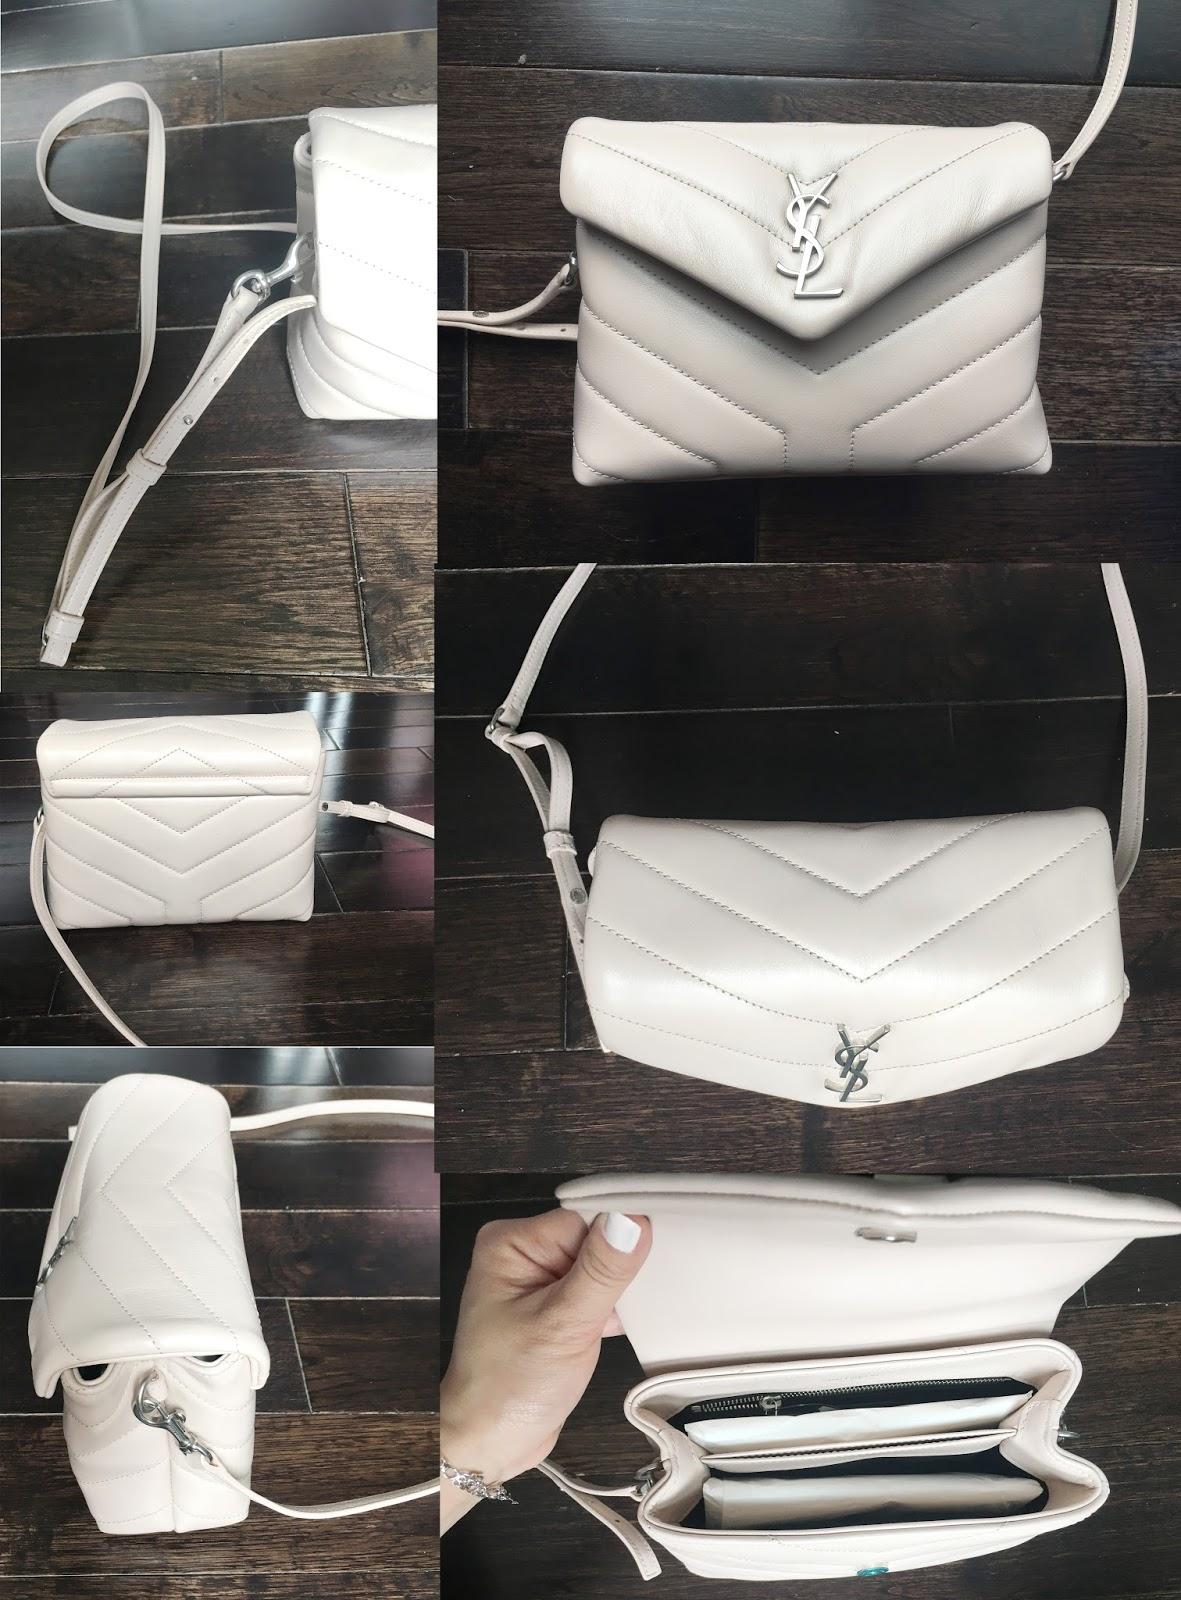 Ysl Toy Loulou Bag Talbot S Reviews